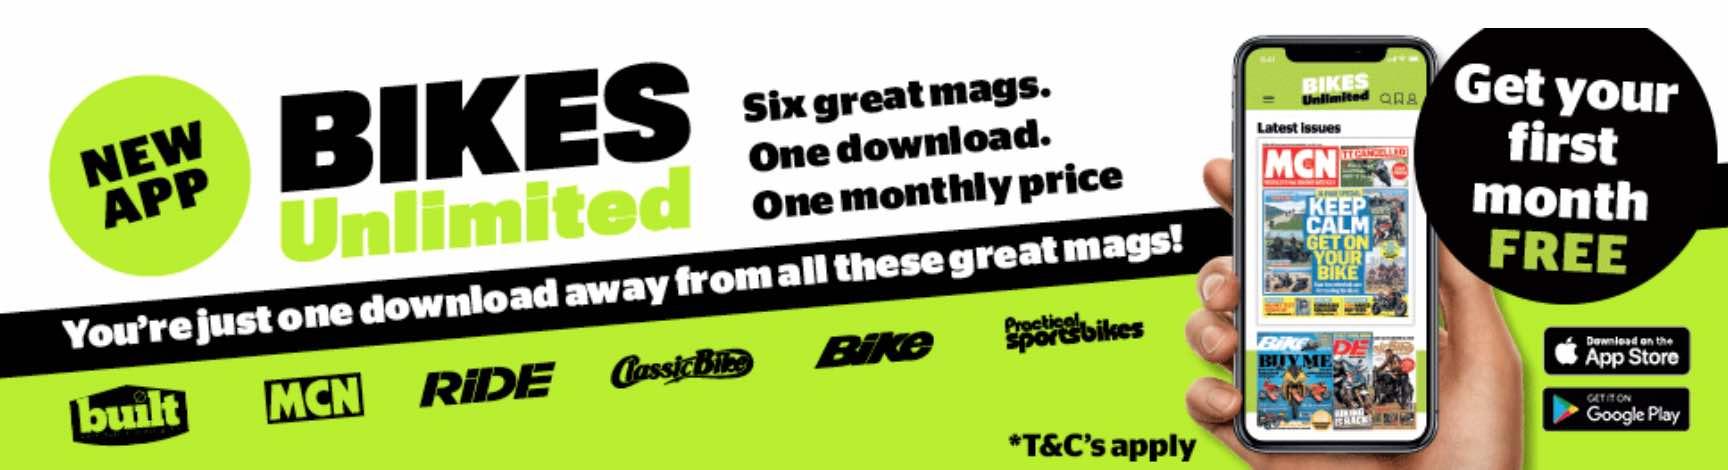 Bikes unlimited banner advertising screenshot